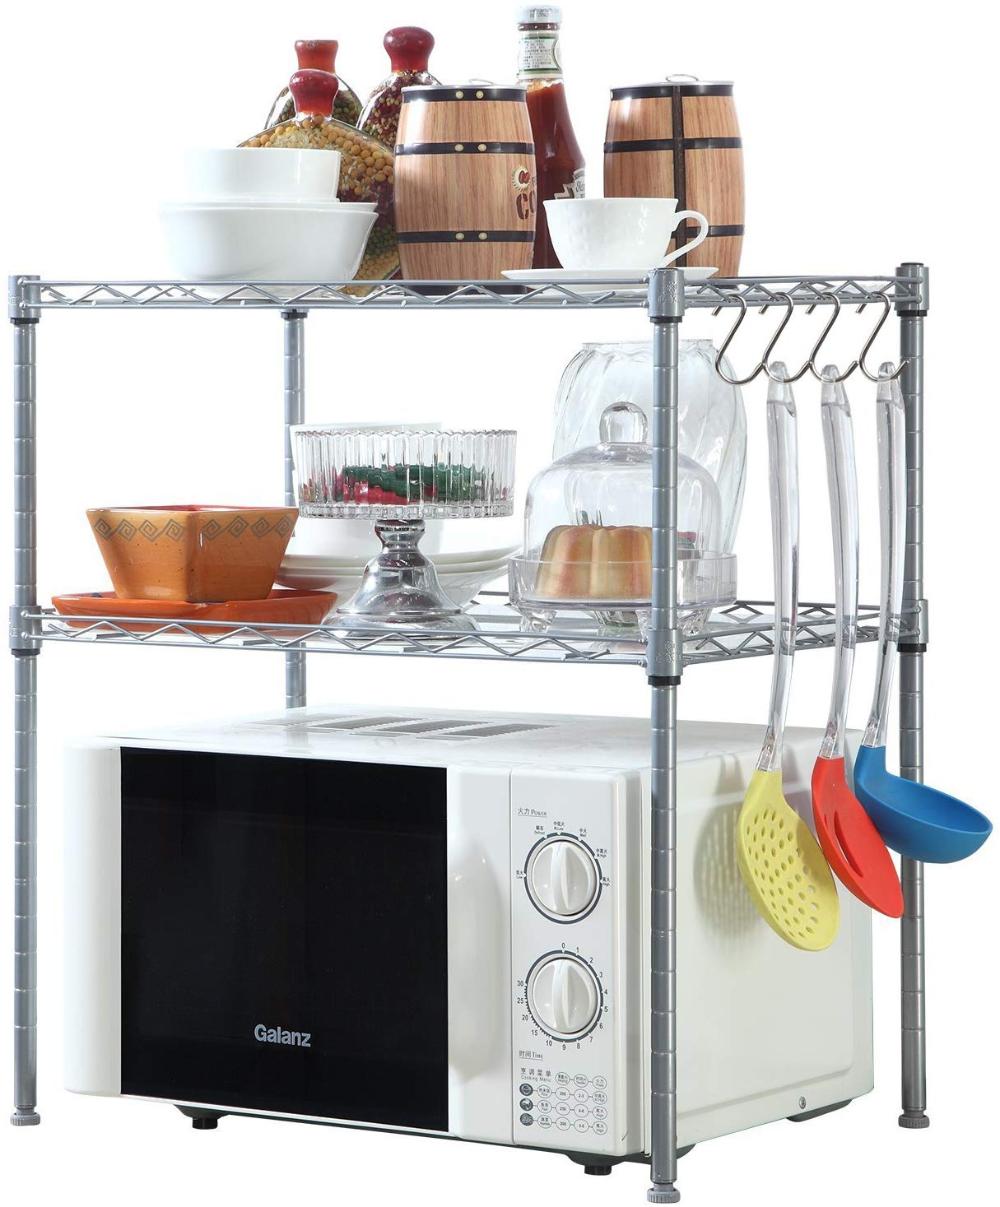 Amazon Com Homfa Kitchen Microwave Oven Rack Shelving Unit 2 Tier Adjustable Stainless Kitchen Storage Shelves Kitchen Shelving Units Kitchen Counter Storage